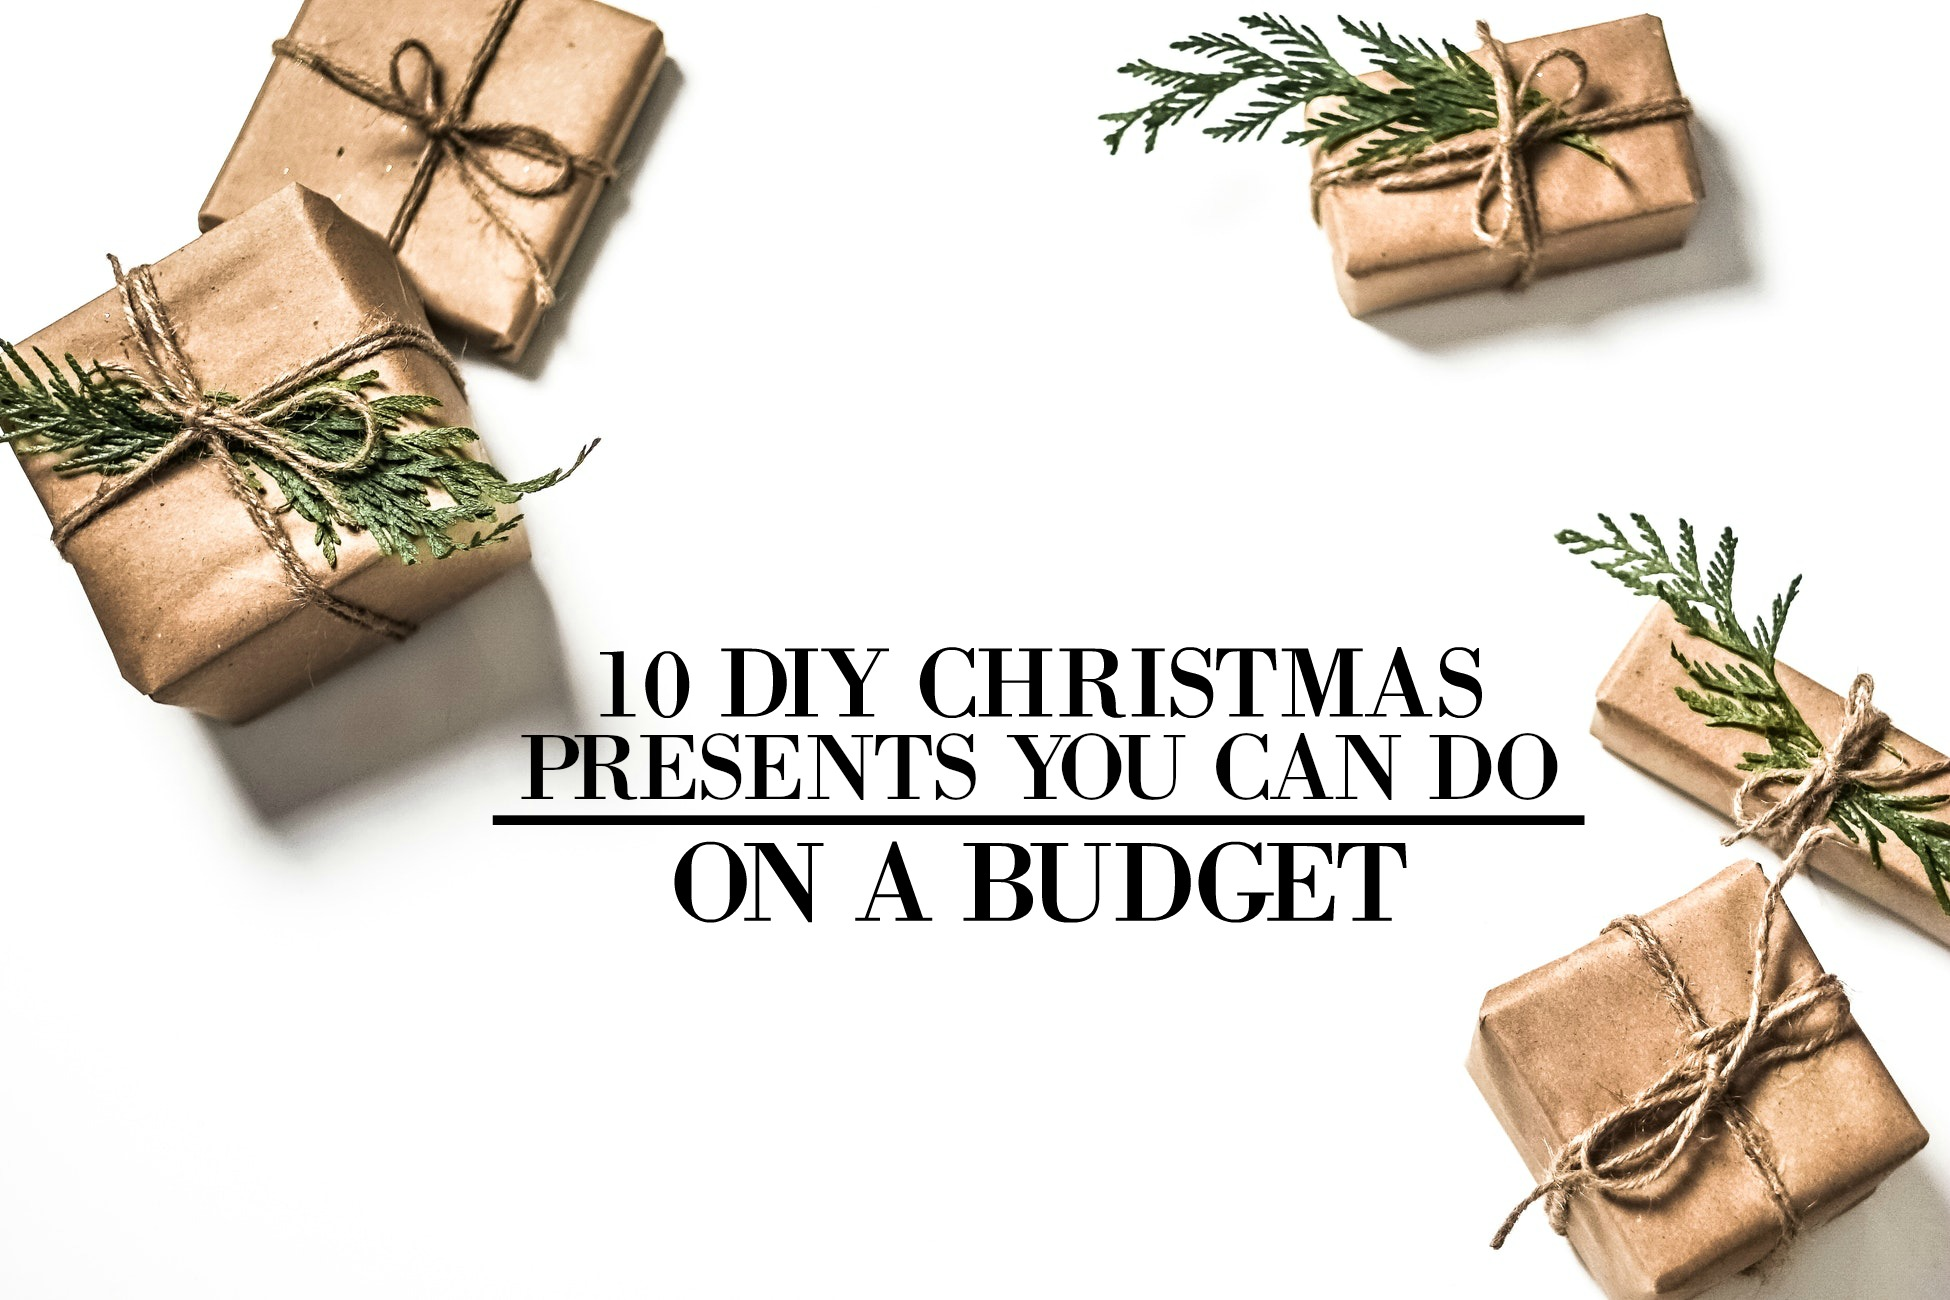 10 DIY Christmas Presents You Can Do on A Budget